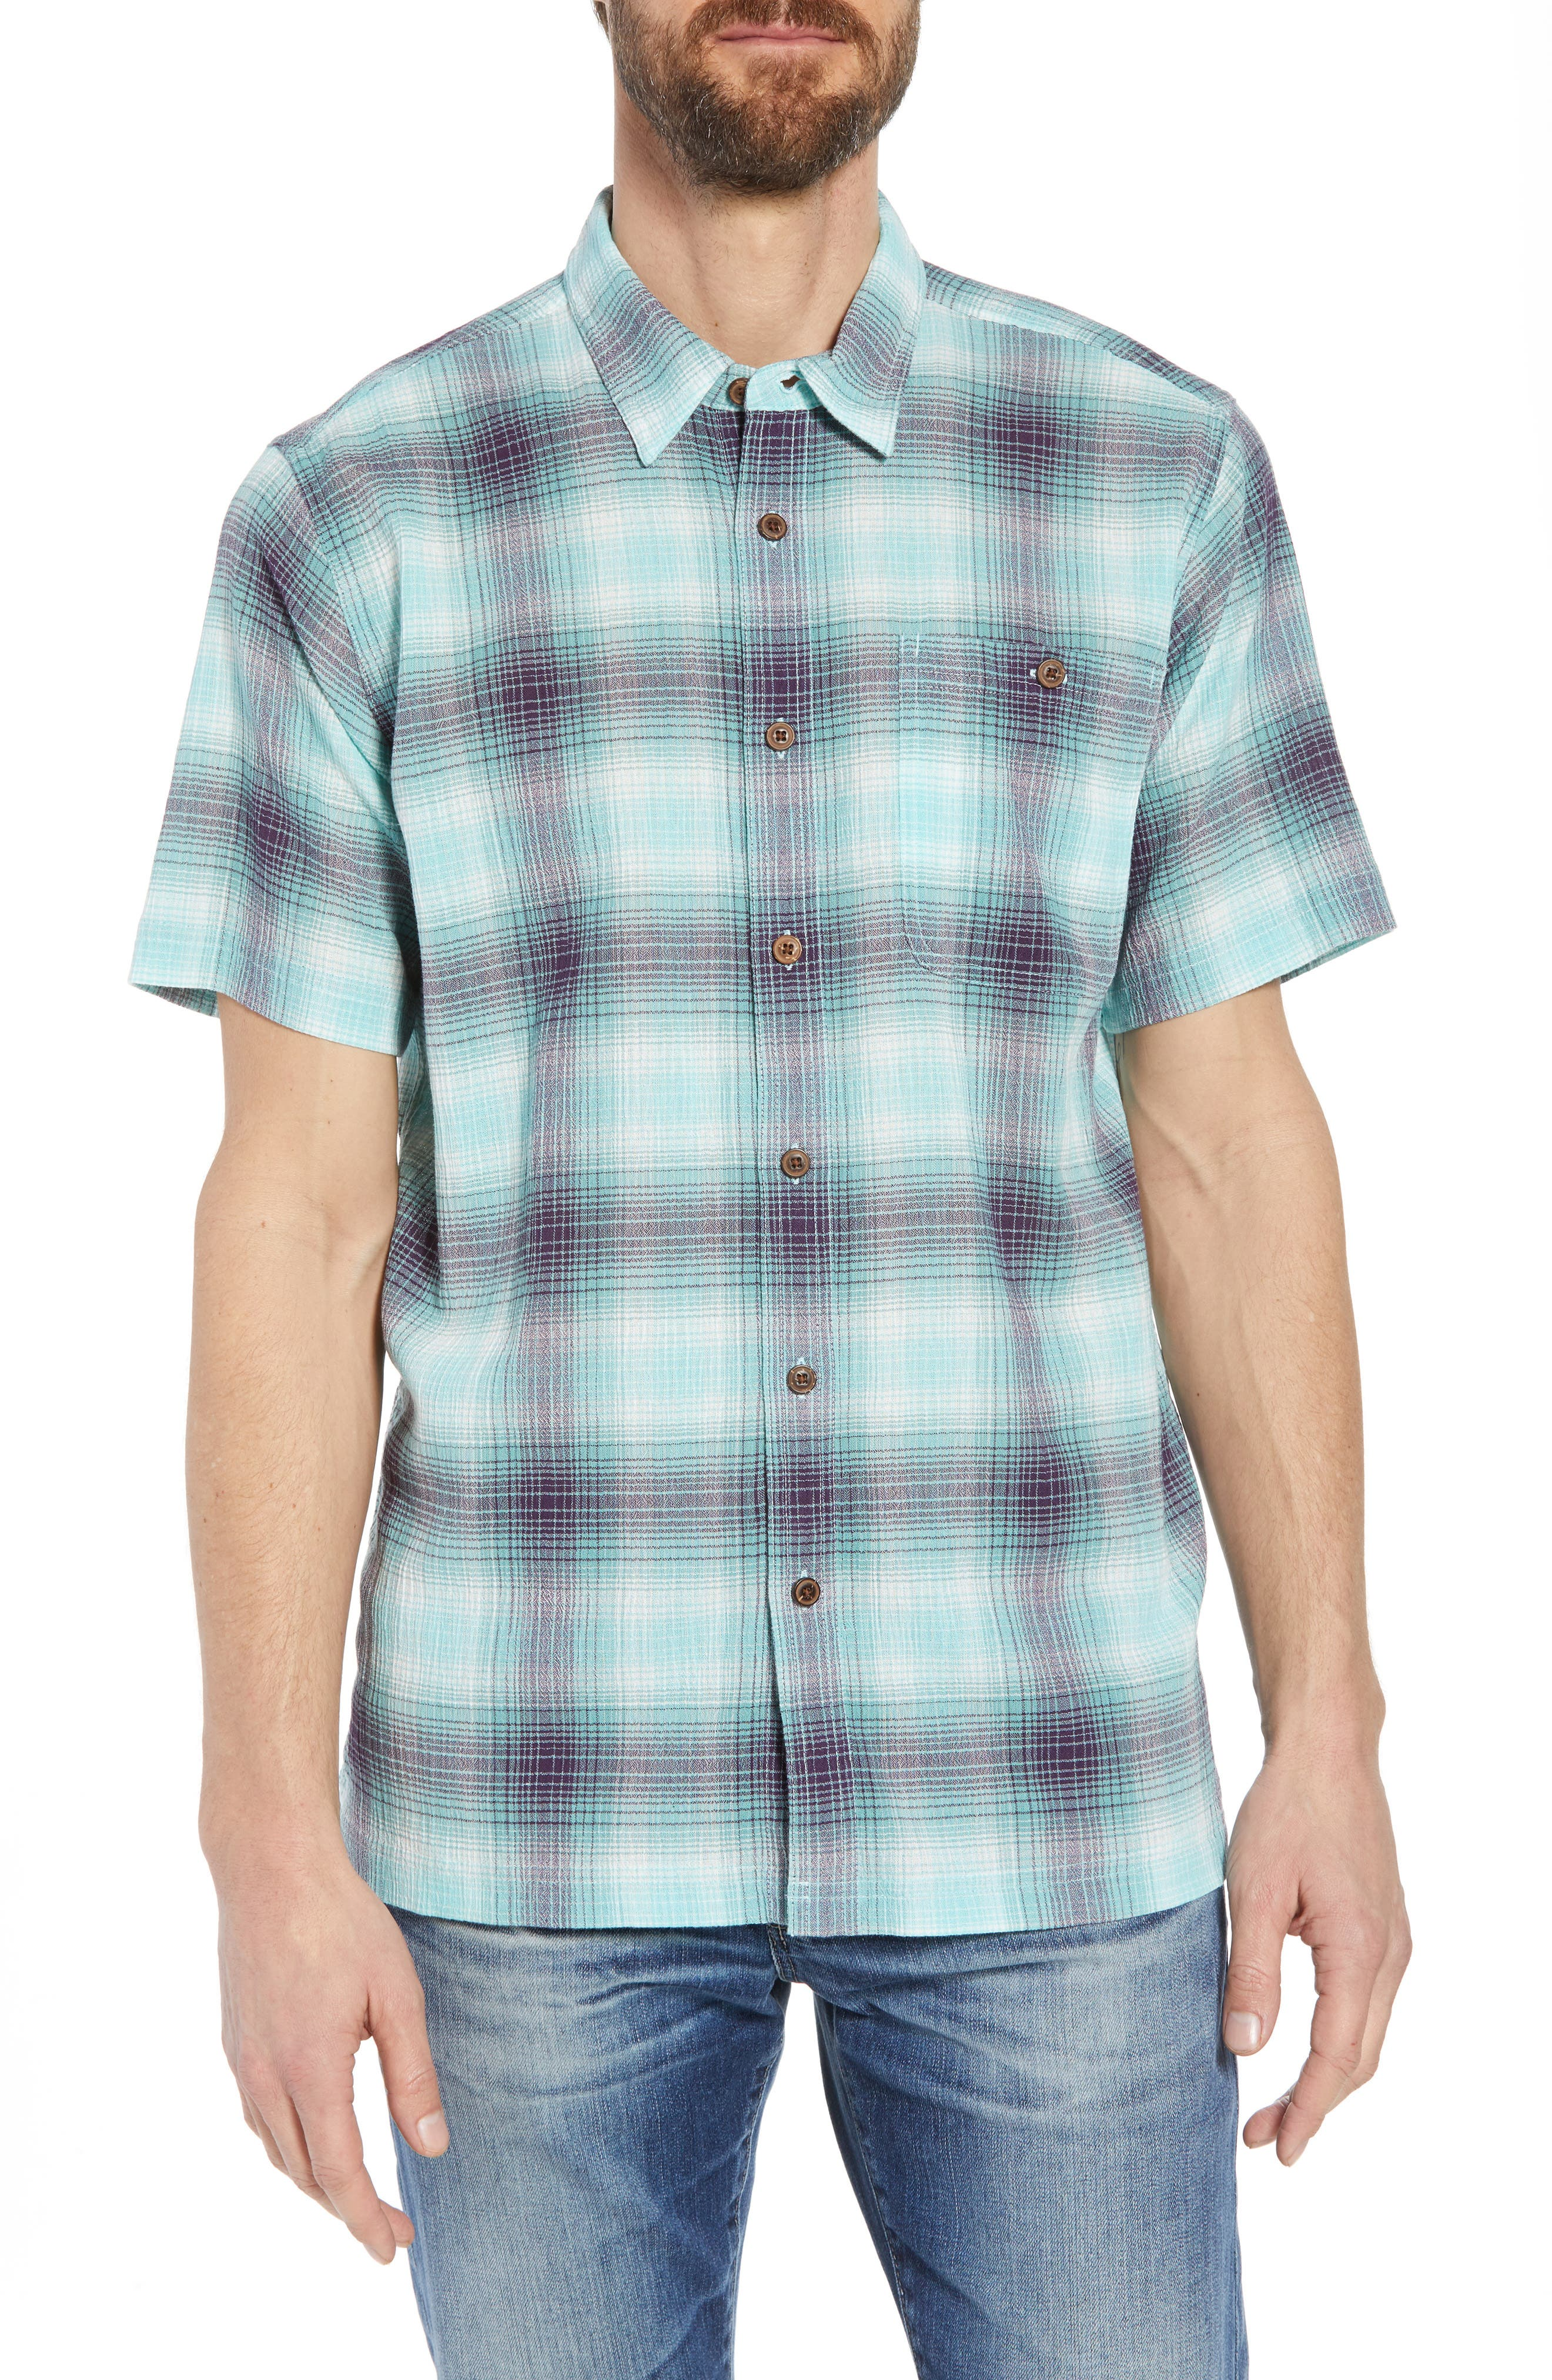 'A/C<sup>®</sup>' Regular Fit Organic Cotton Short Sleeve Sport Shirt,                             Main thumbnail 1, color,                             COSTA/ BERYL GREEN